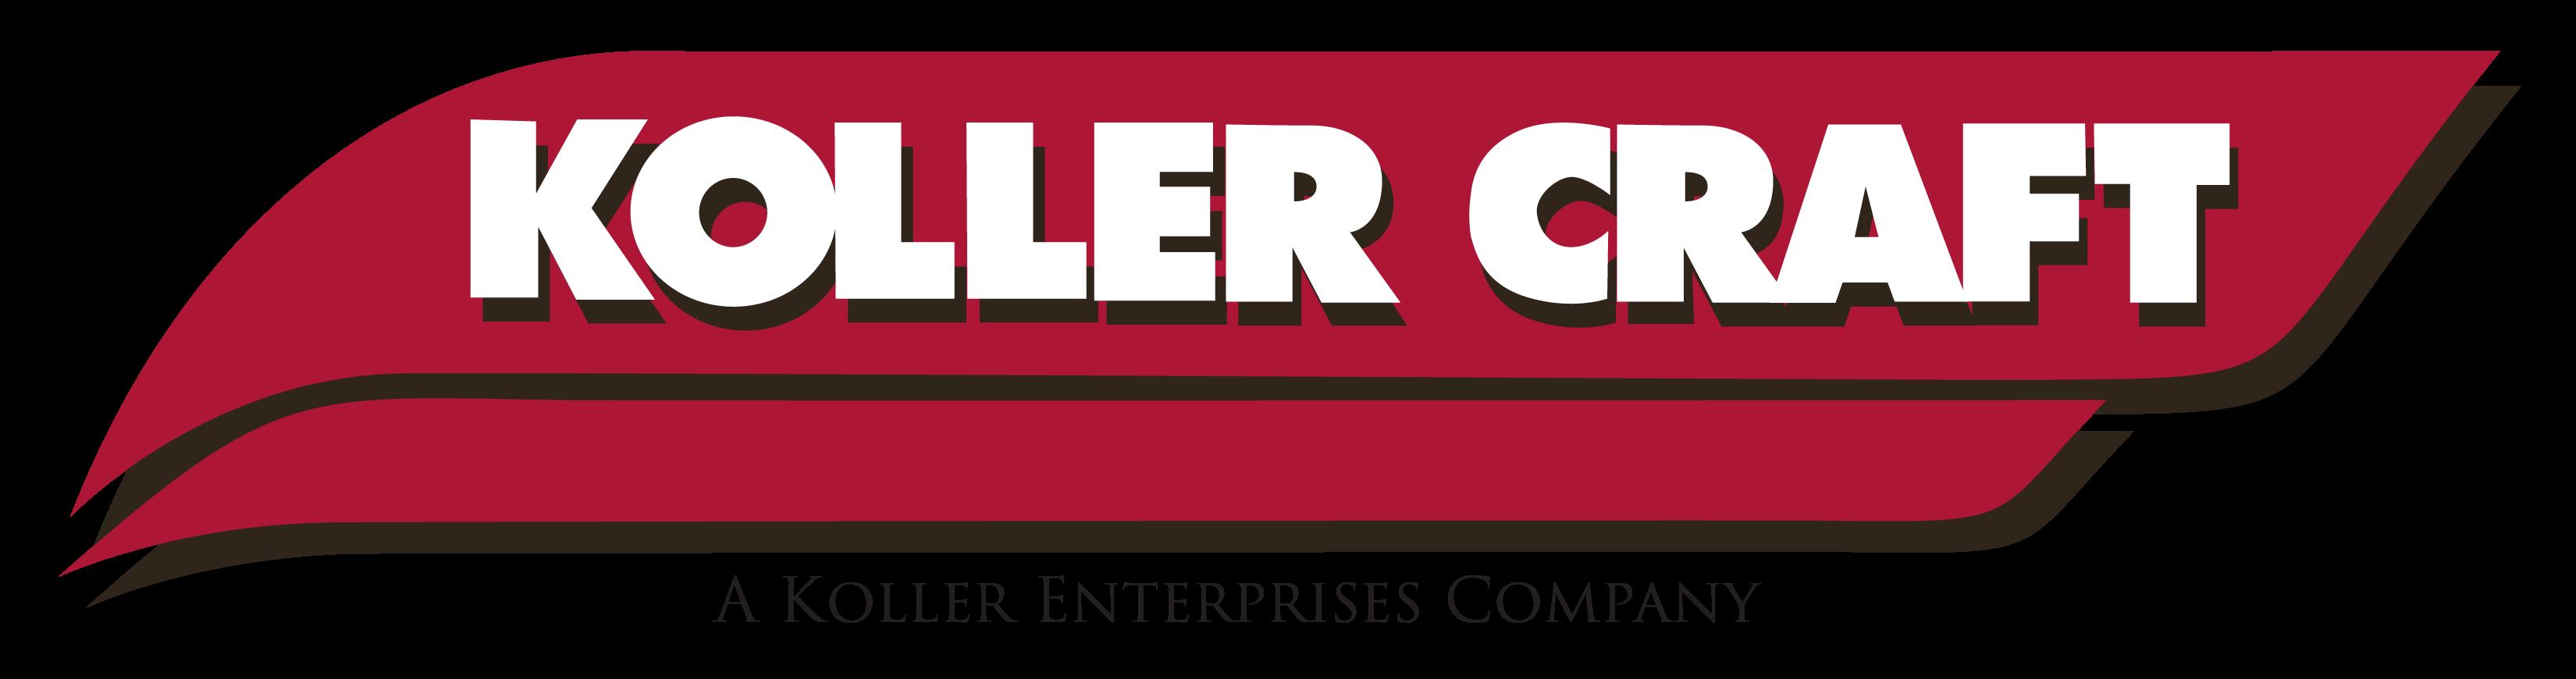 Koller Craft, LLC